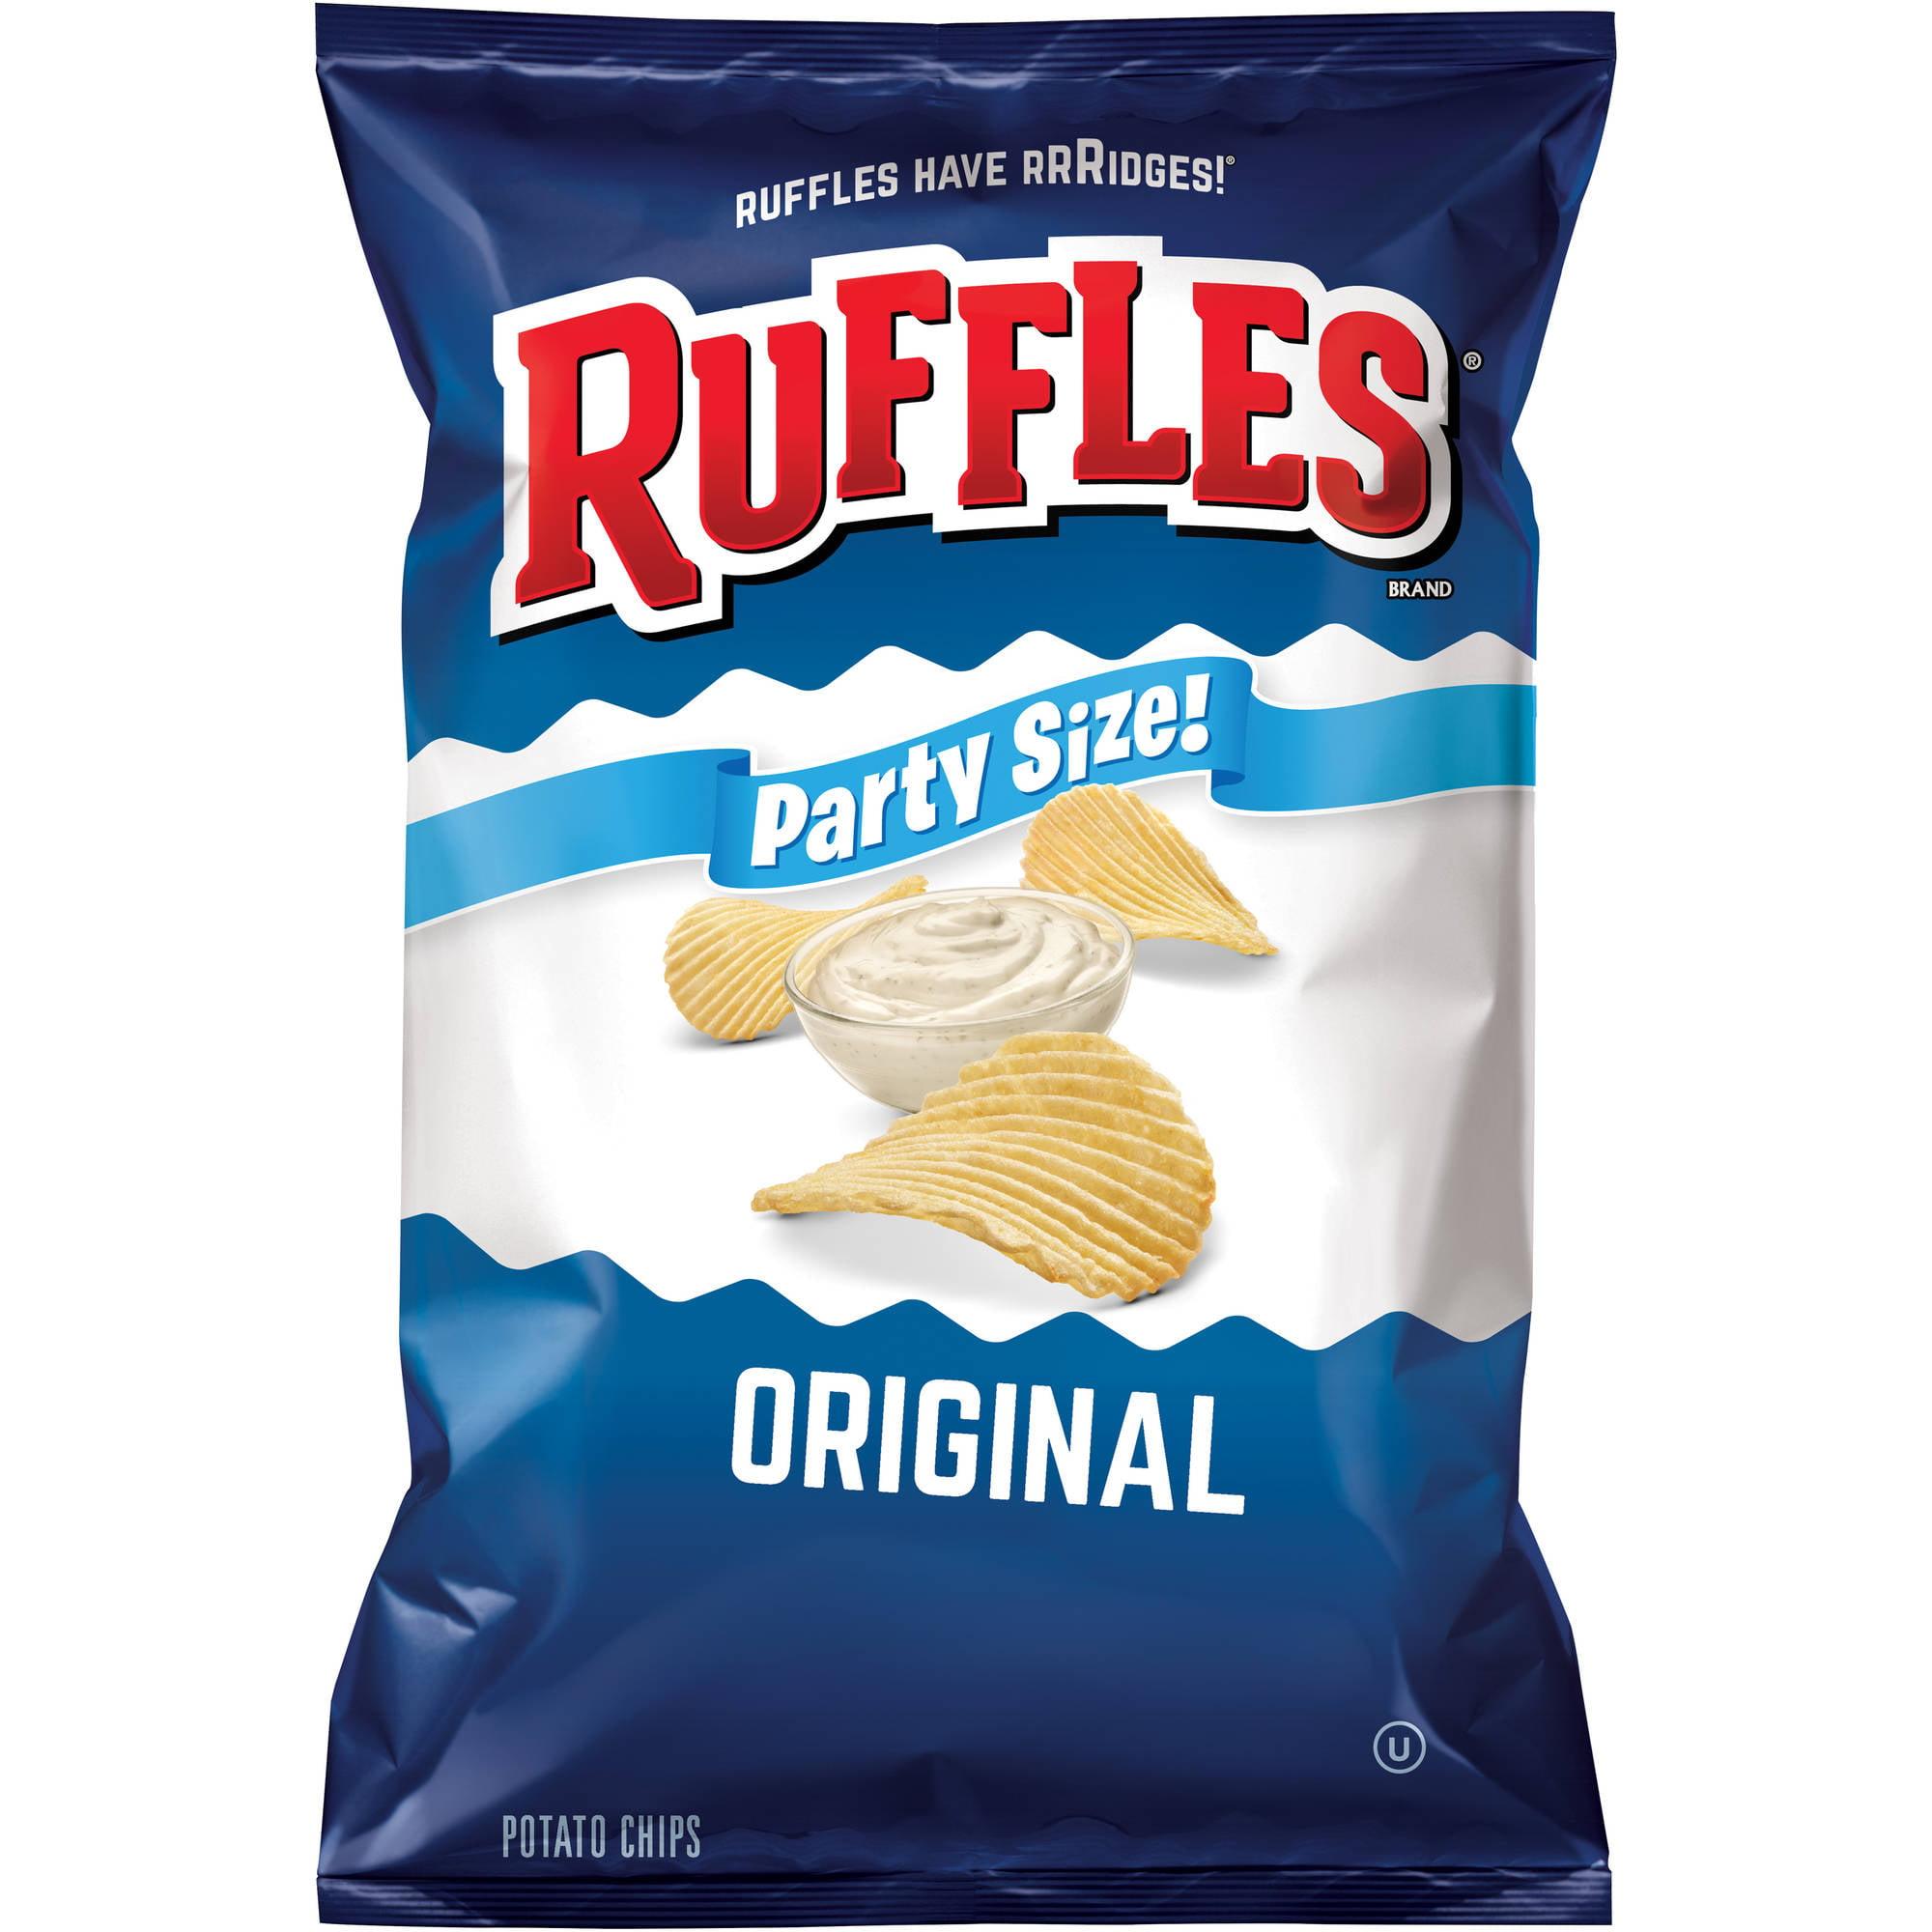 Ruffles Party Size Original Potato Chips, 14.5 Oz.